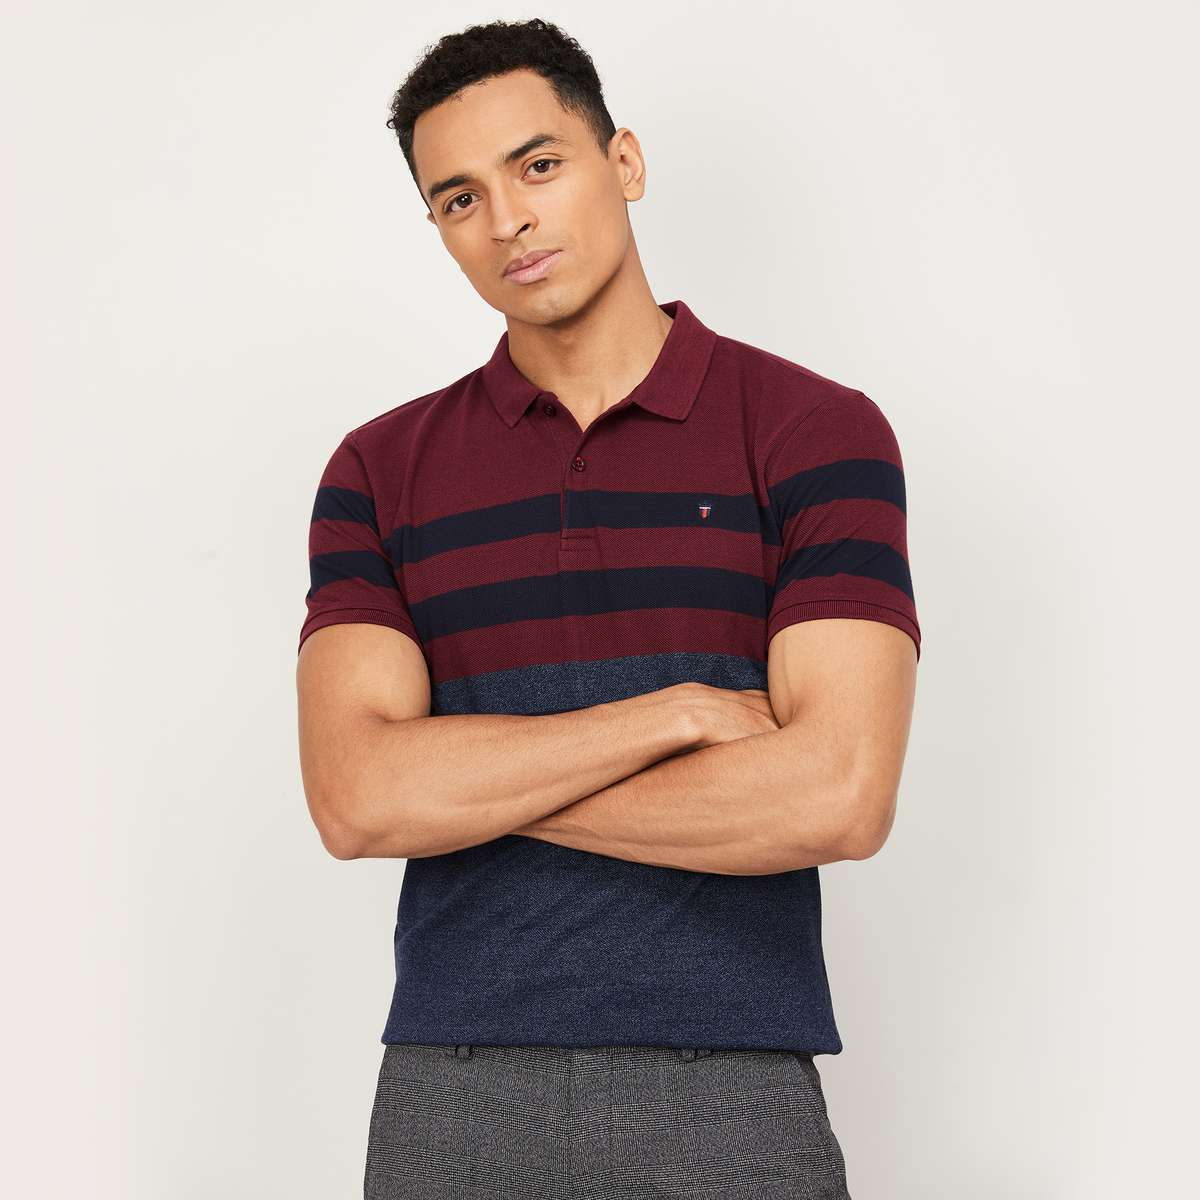 3.LP SPORT Men Colourblocked Polo T-Shirt